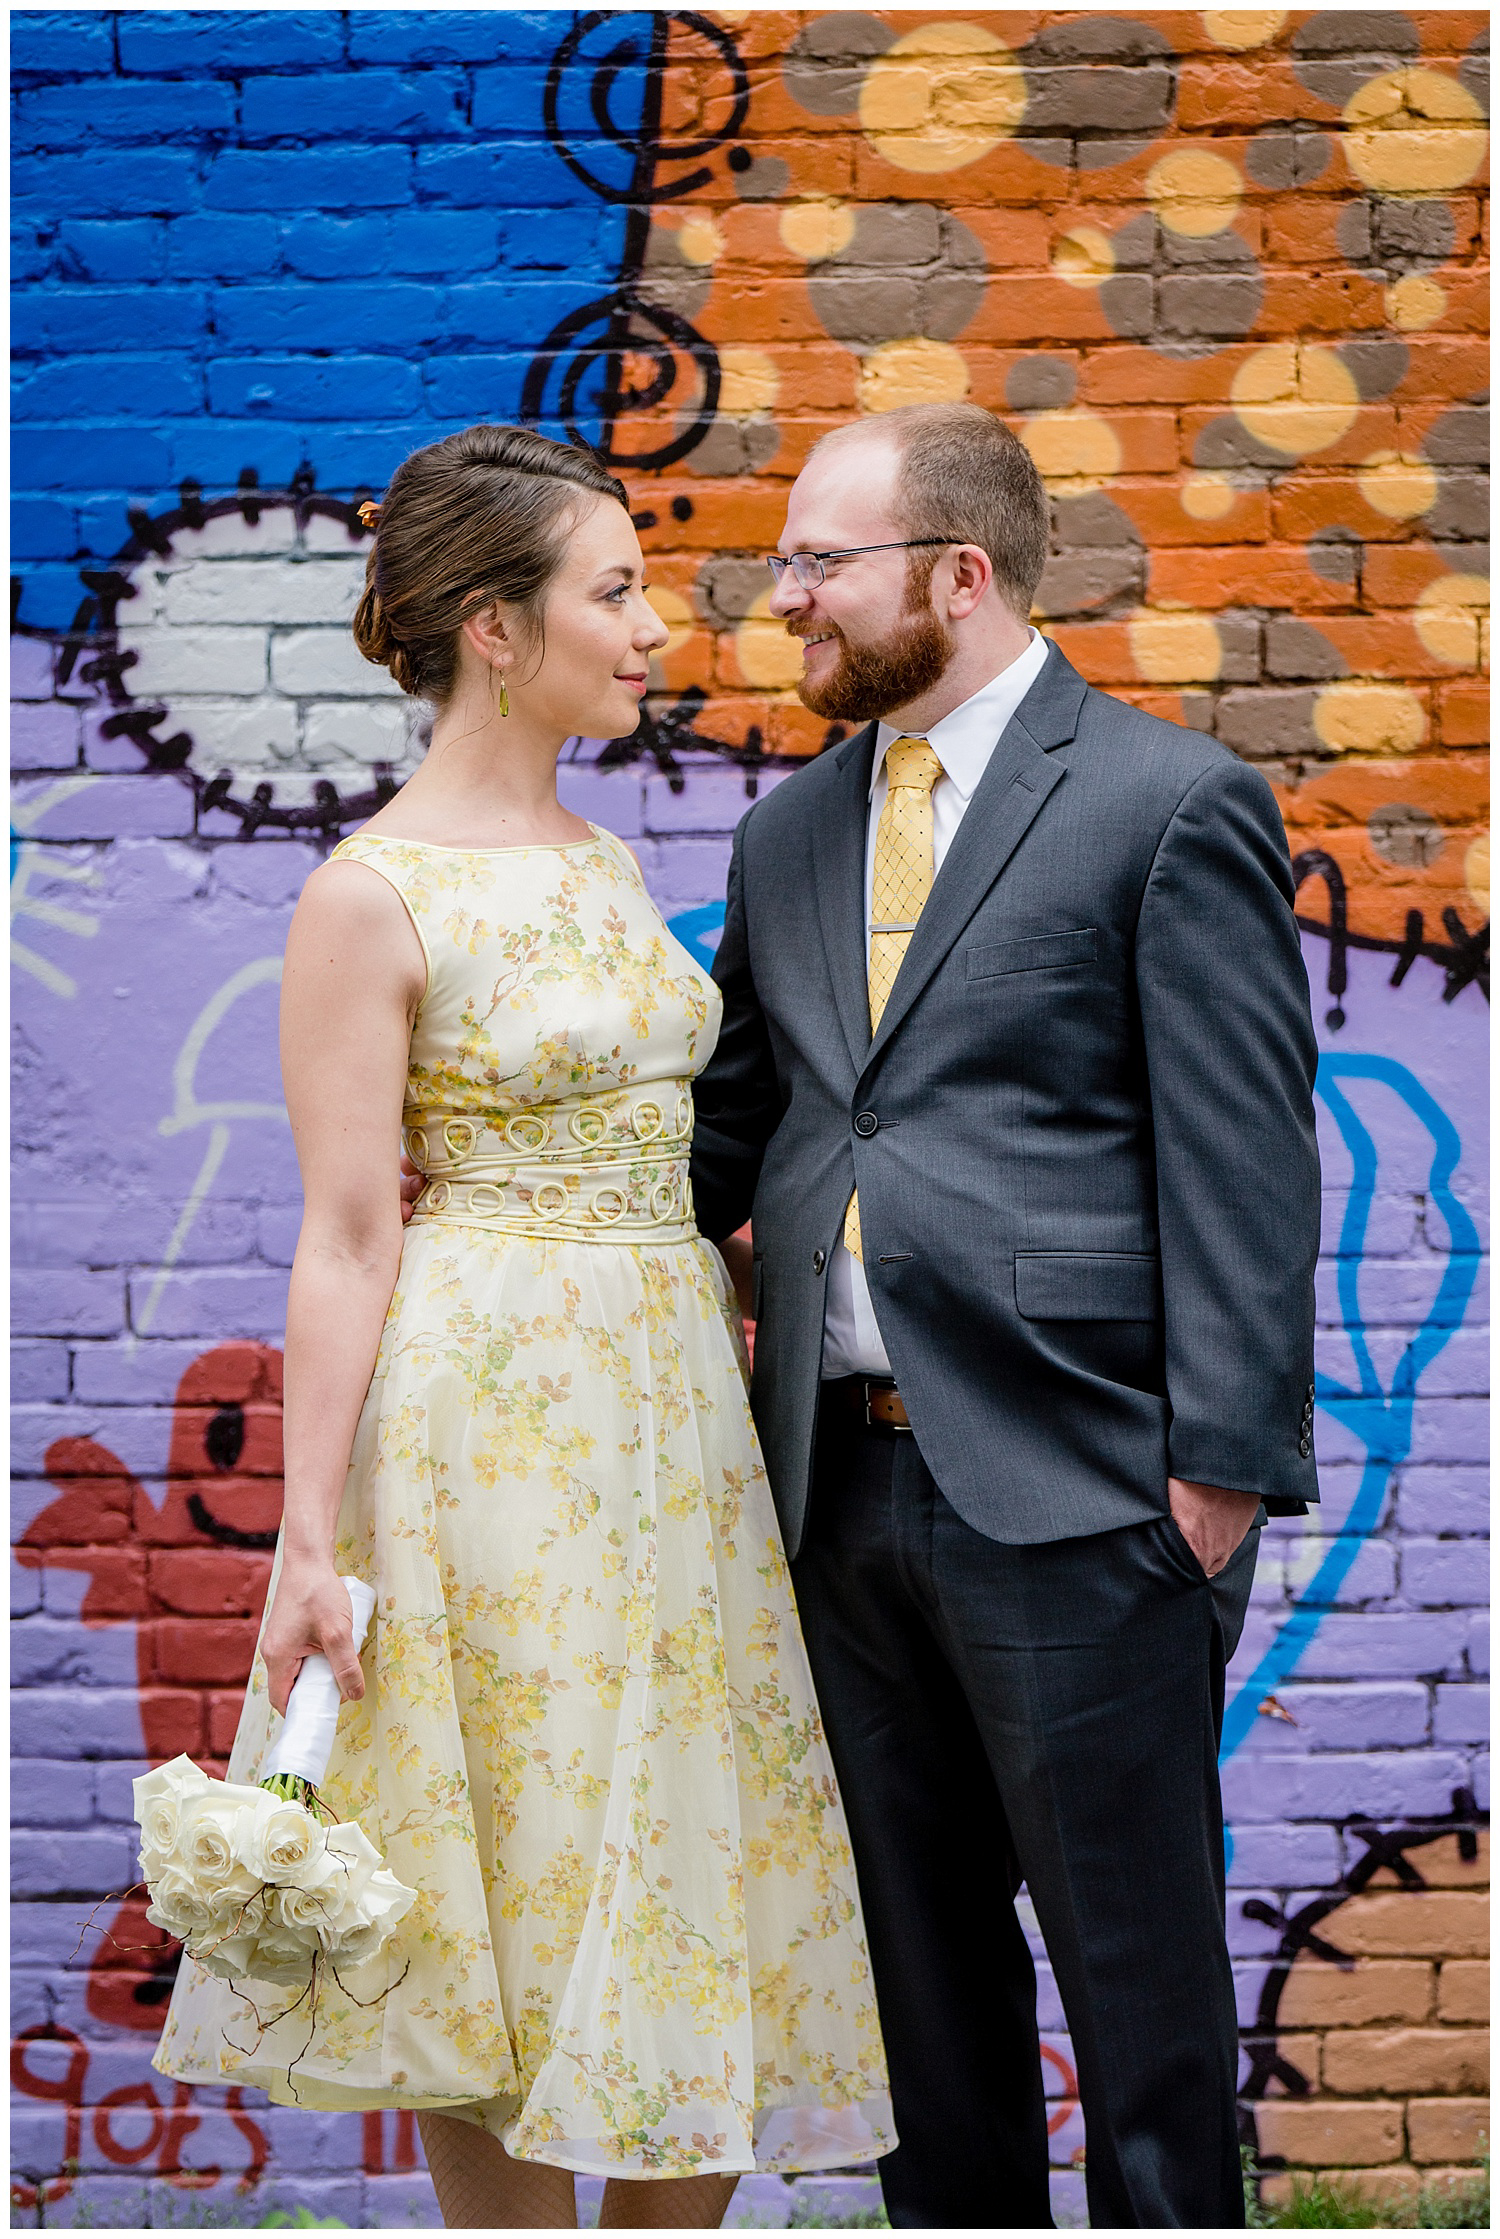 Lynn-Musuem-Wedding-Boston-Photographer-26-North-Studios-013.jpg